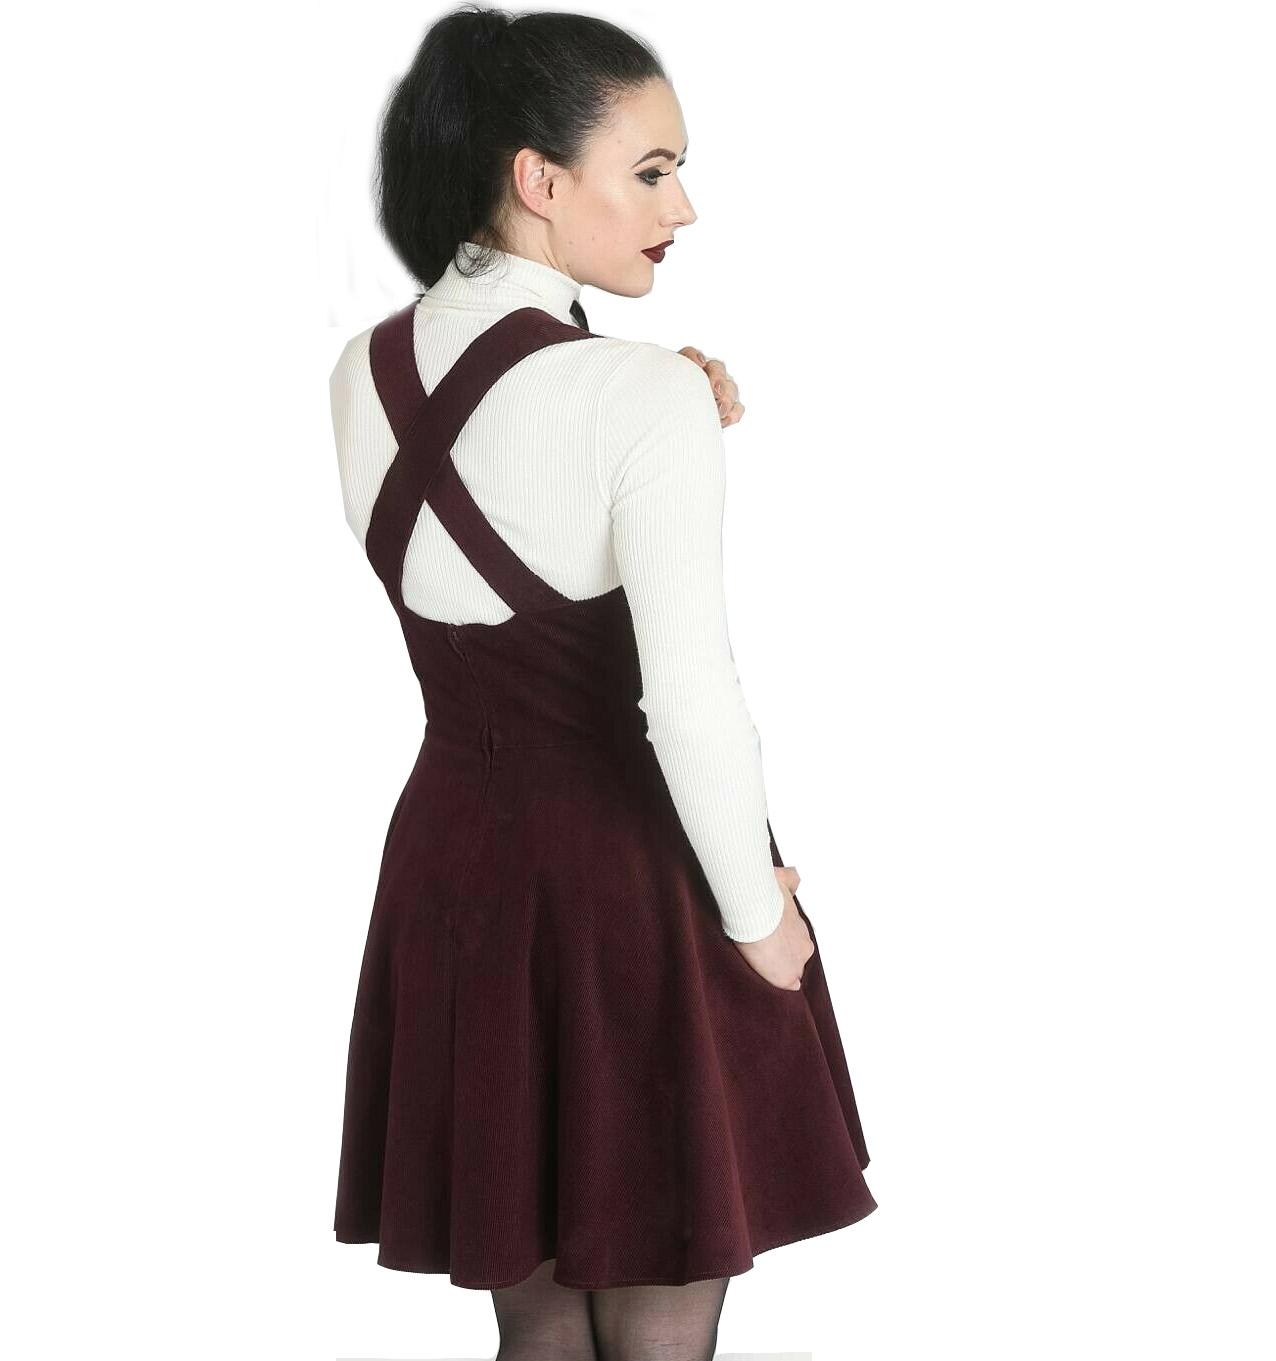 Hell-Bunny-Rockabilly-Corduroy-Mini-Dress-WONDER-YEARS-Pinafore-Wine-All-Sizes thumbnail 21